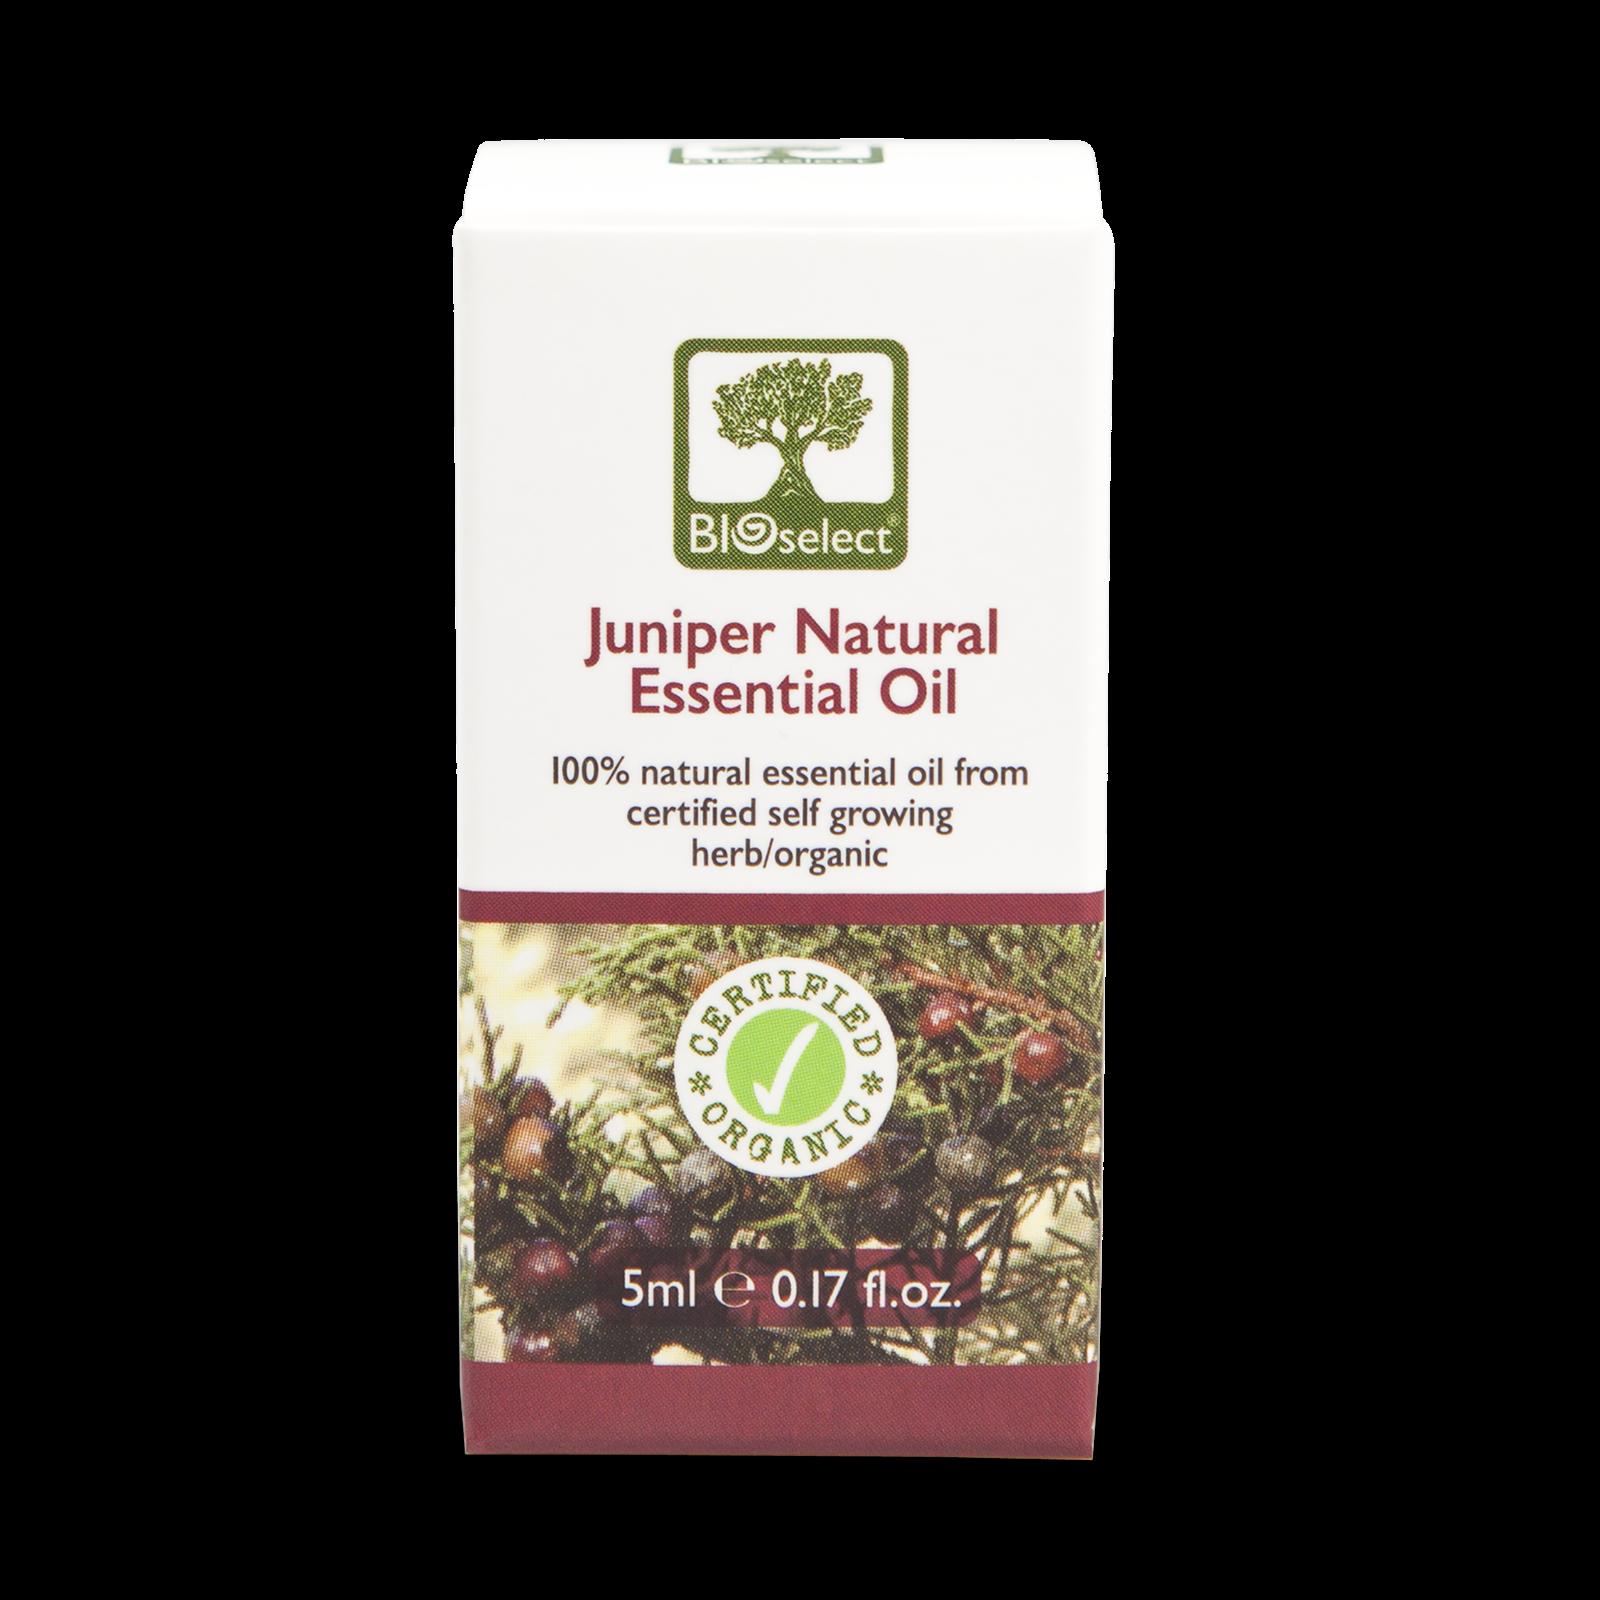 Bioselect Juniper Natural Essential Oil Certified Organic